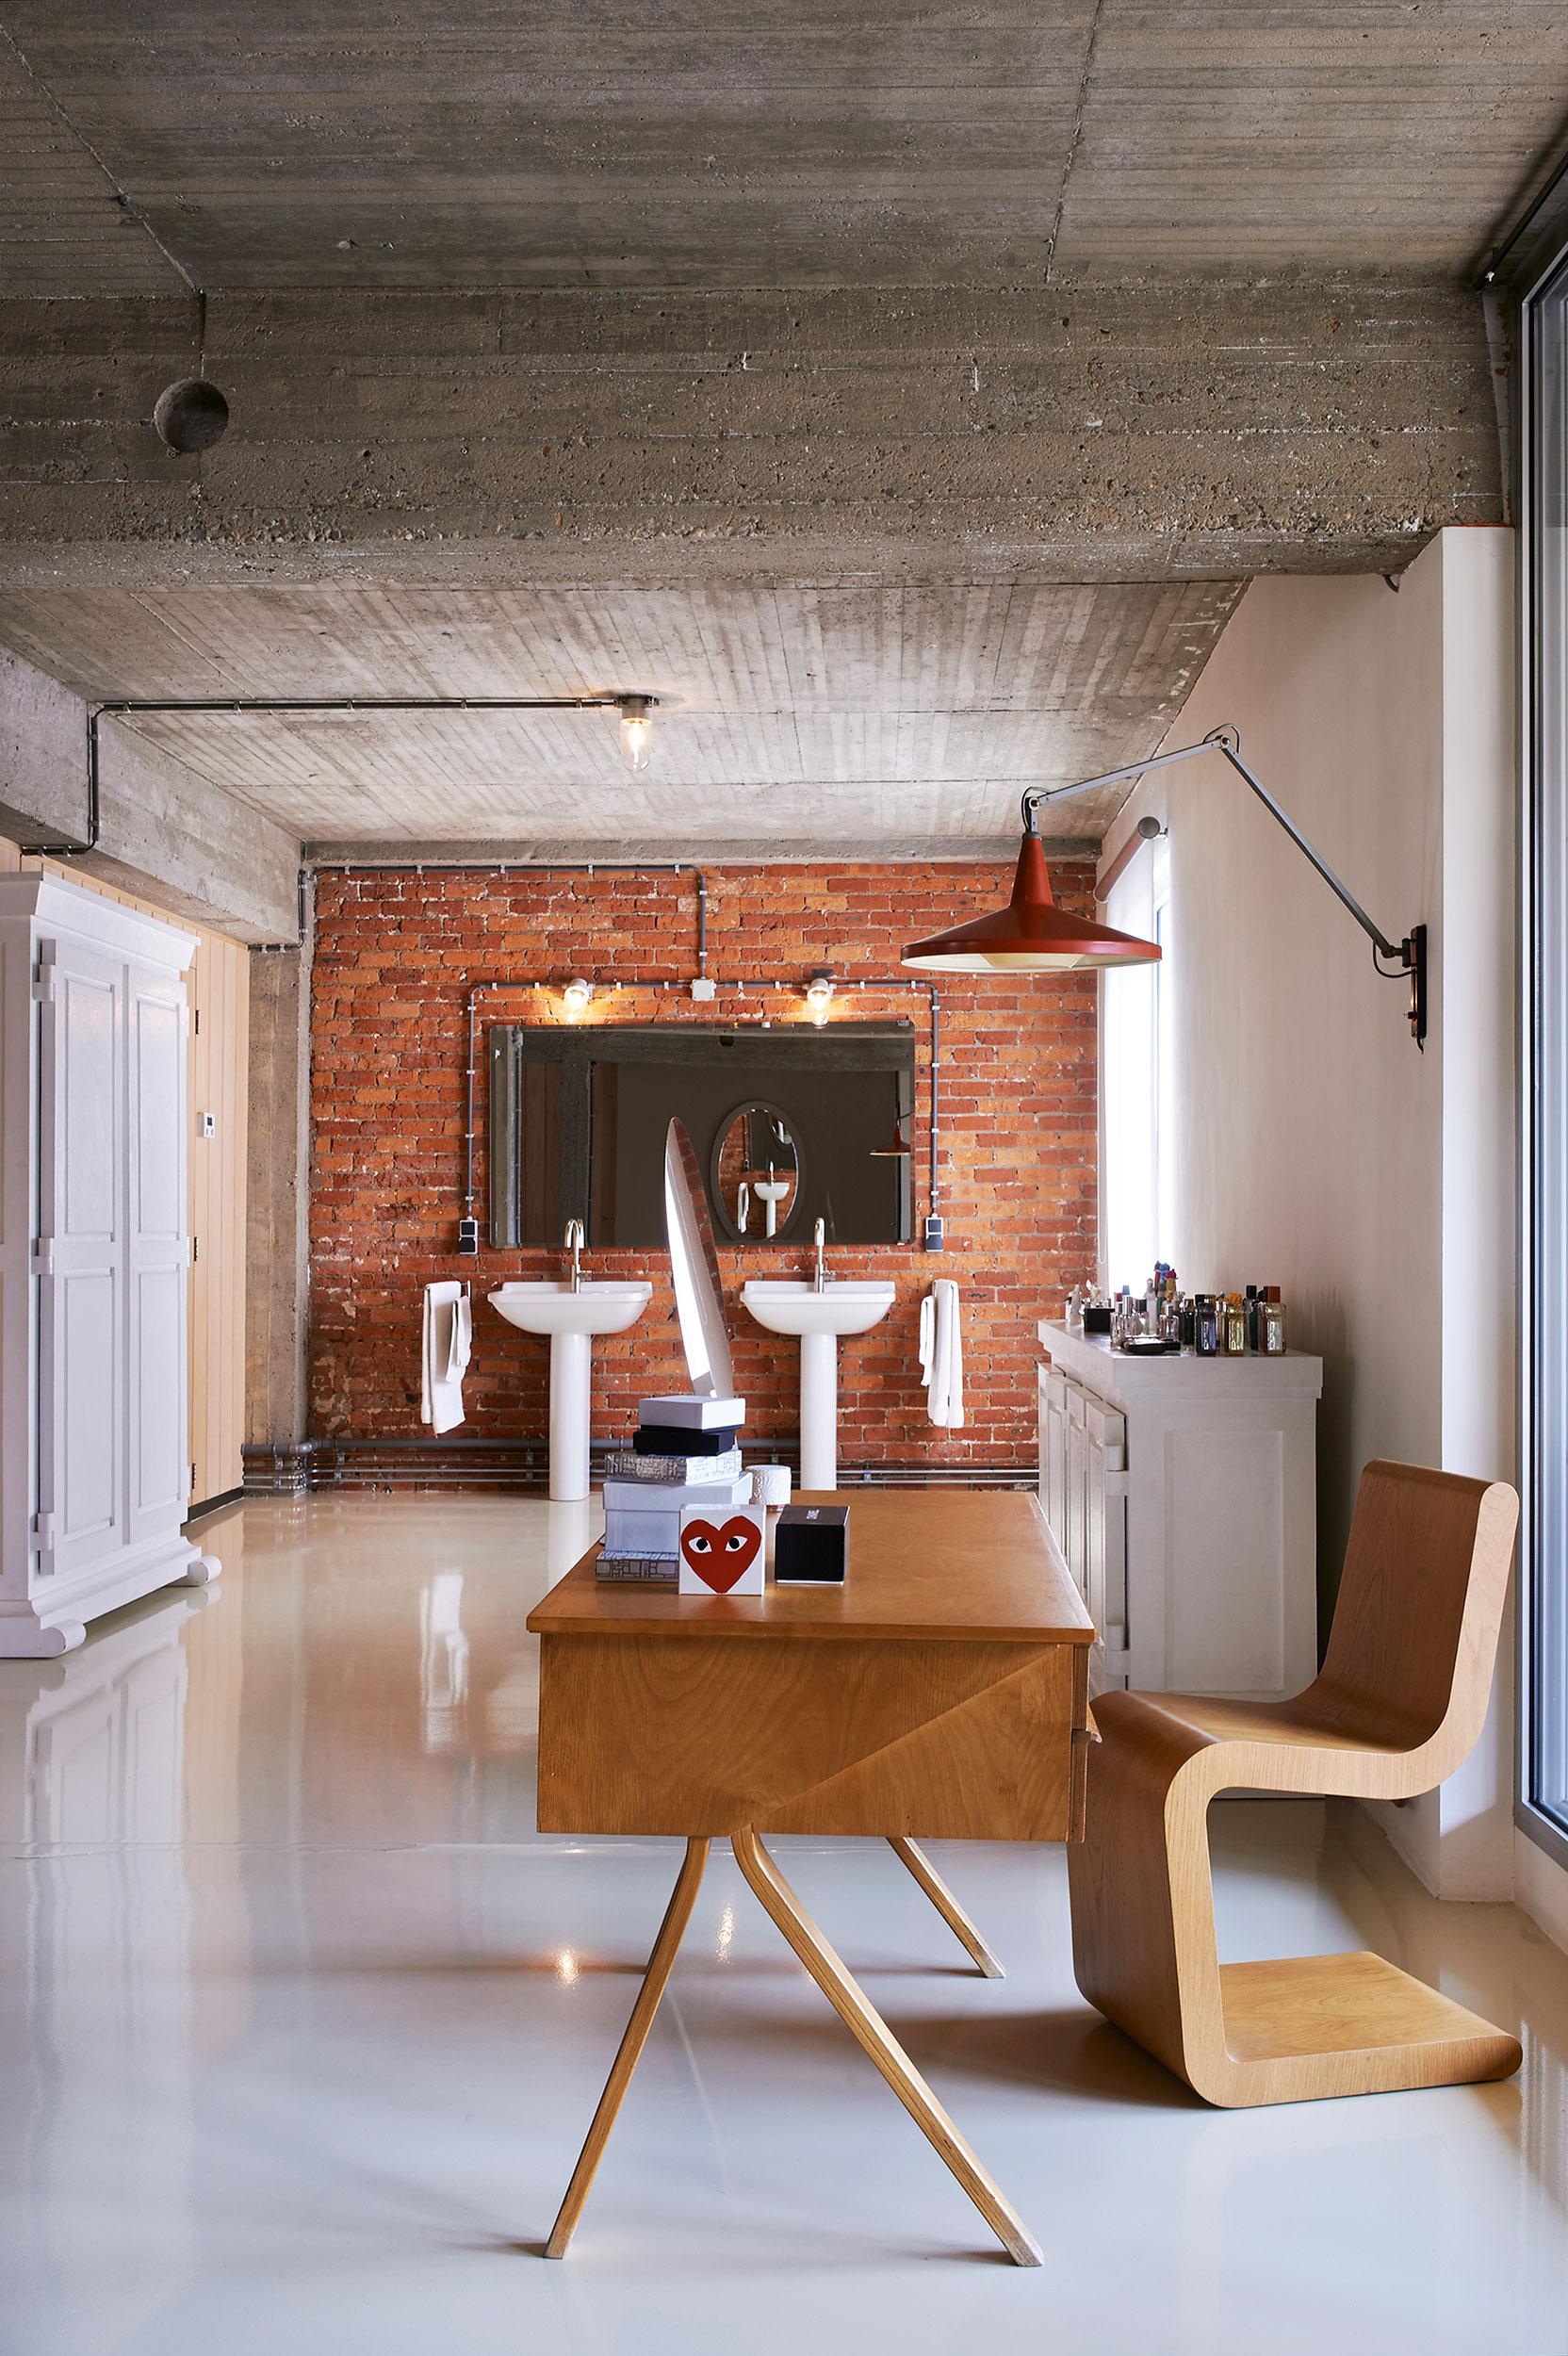 Studio-Job-Loft-2nd-floor-bathroom-ph-Dennis-Brandsma-22713-0242-2480x3727